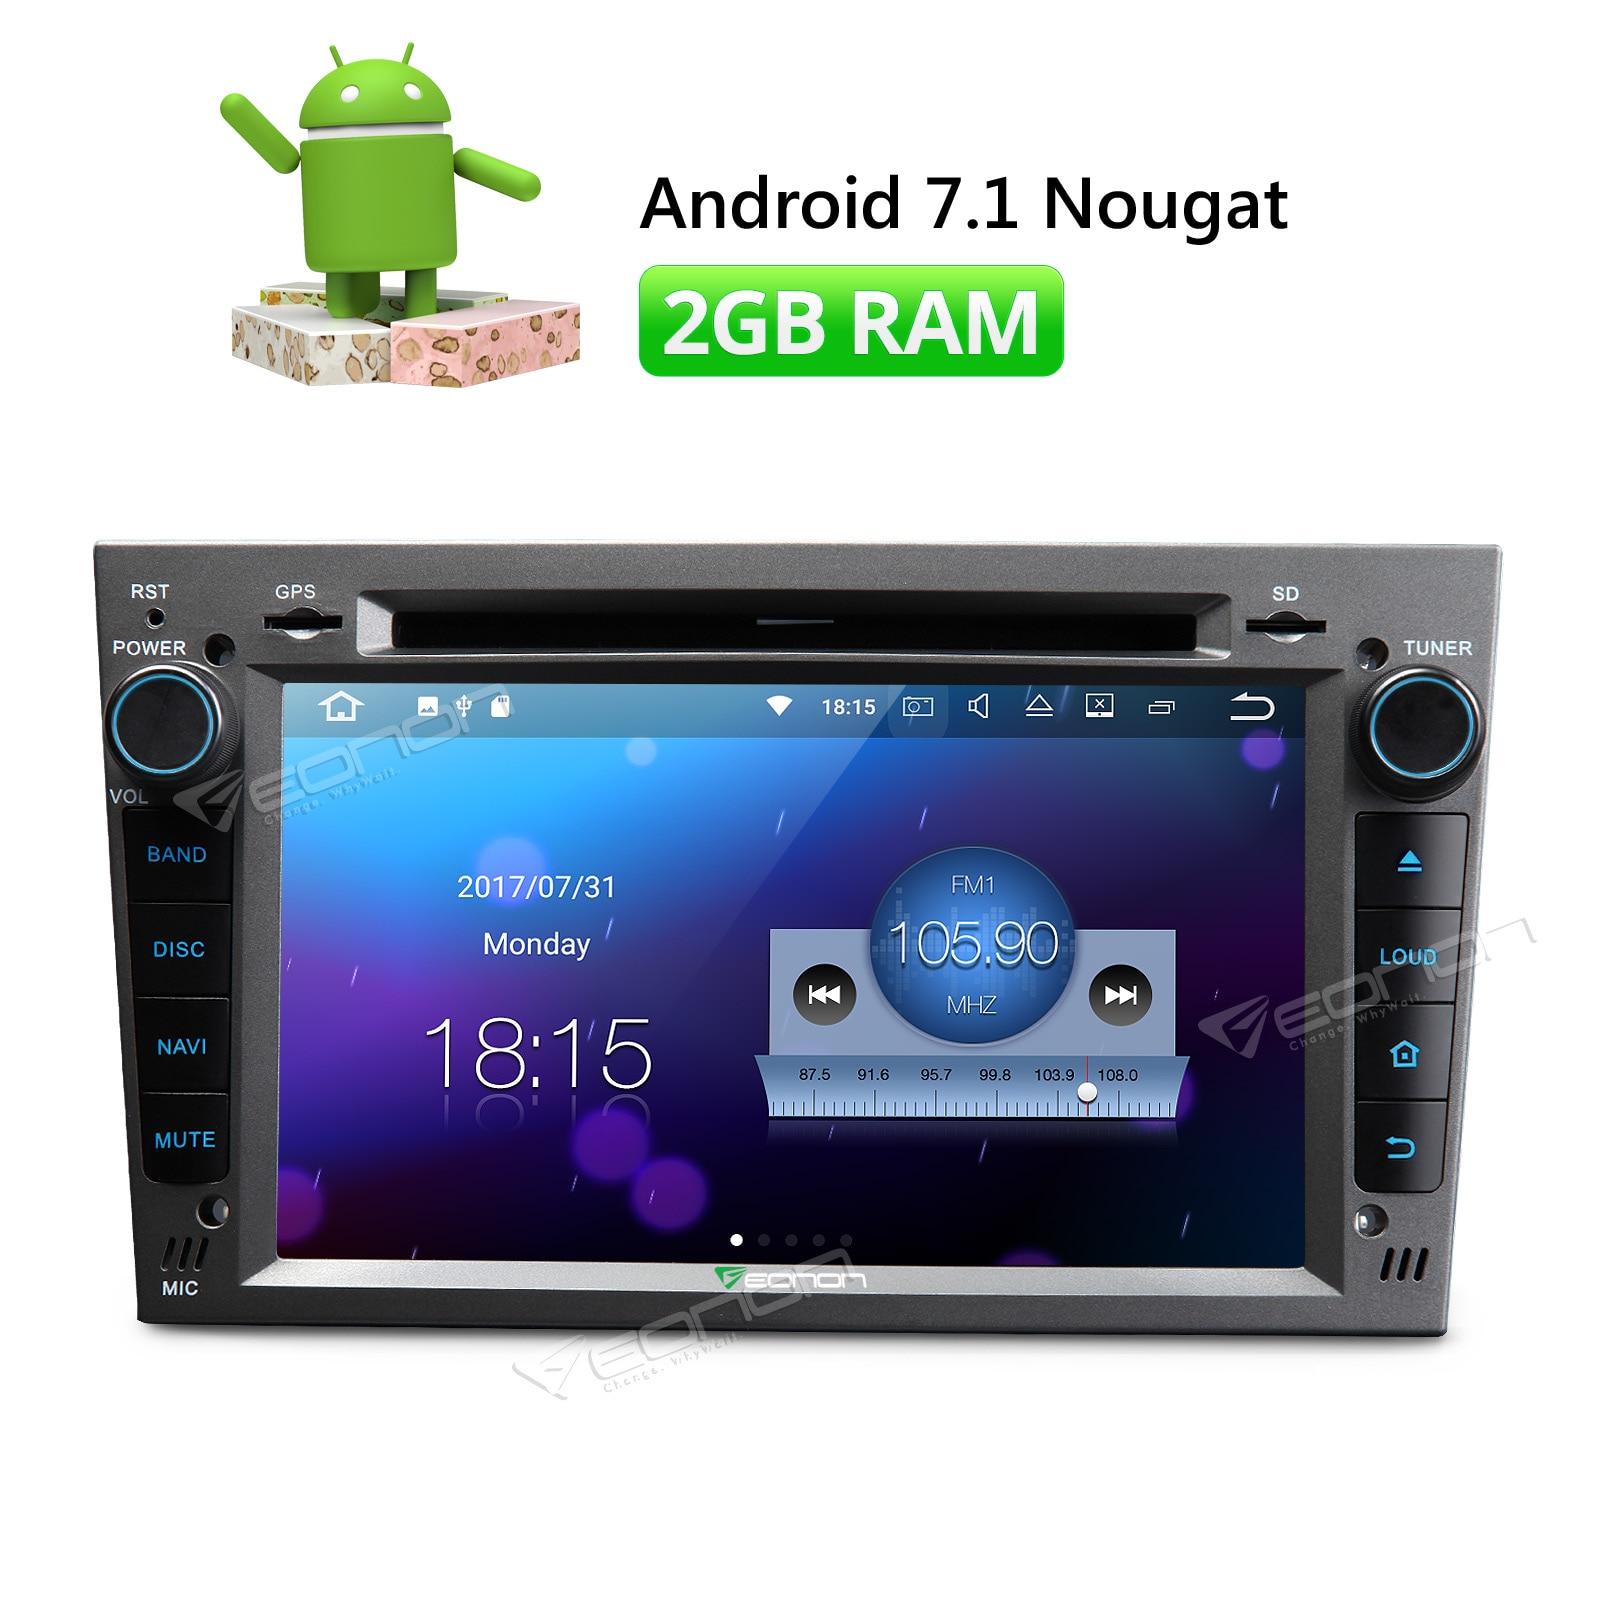 Eonon Grey Ga8154 7 Android 71 In Dash Car Stereo Gps Navigator Wiring Diagram Radio For Opel Corsa Astra Zafira Vectra Antara Meriva Multimedia Player From